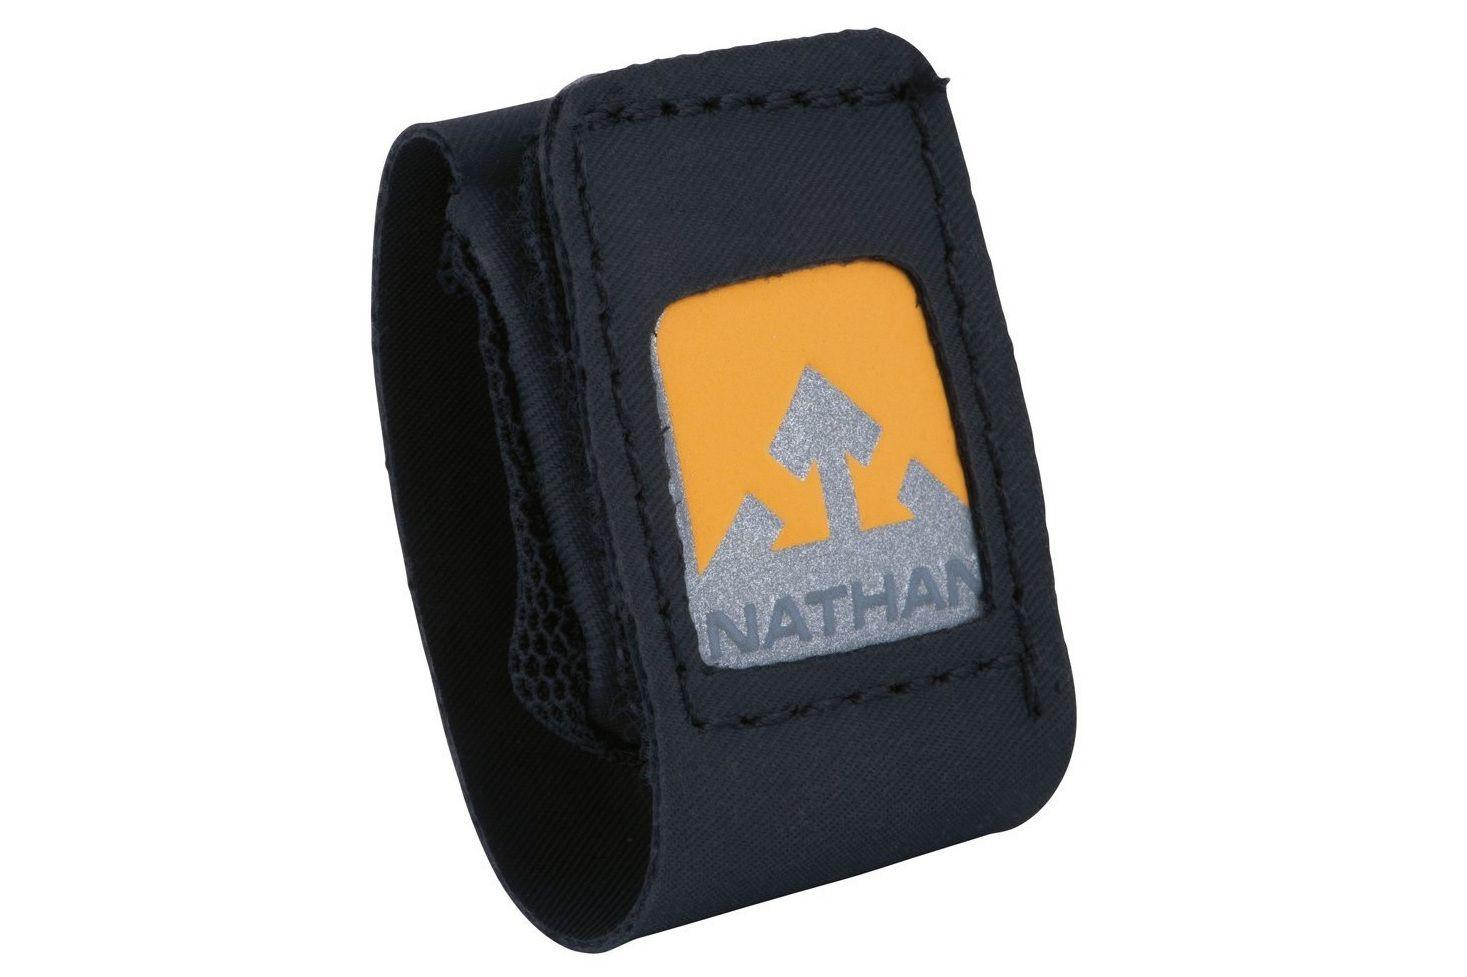 Nathan Sensor Pouch